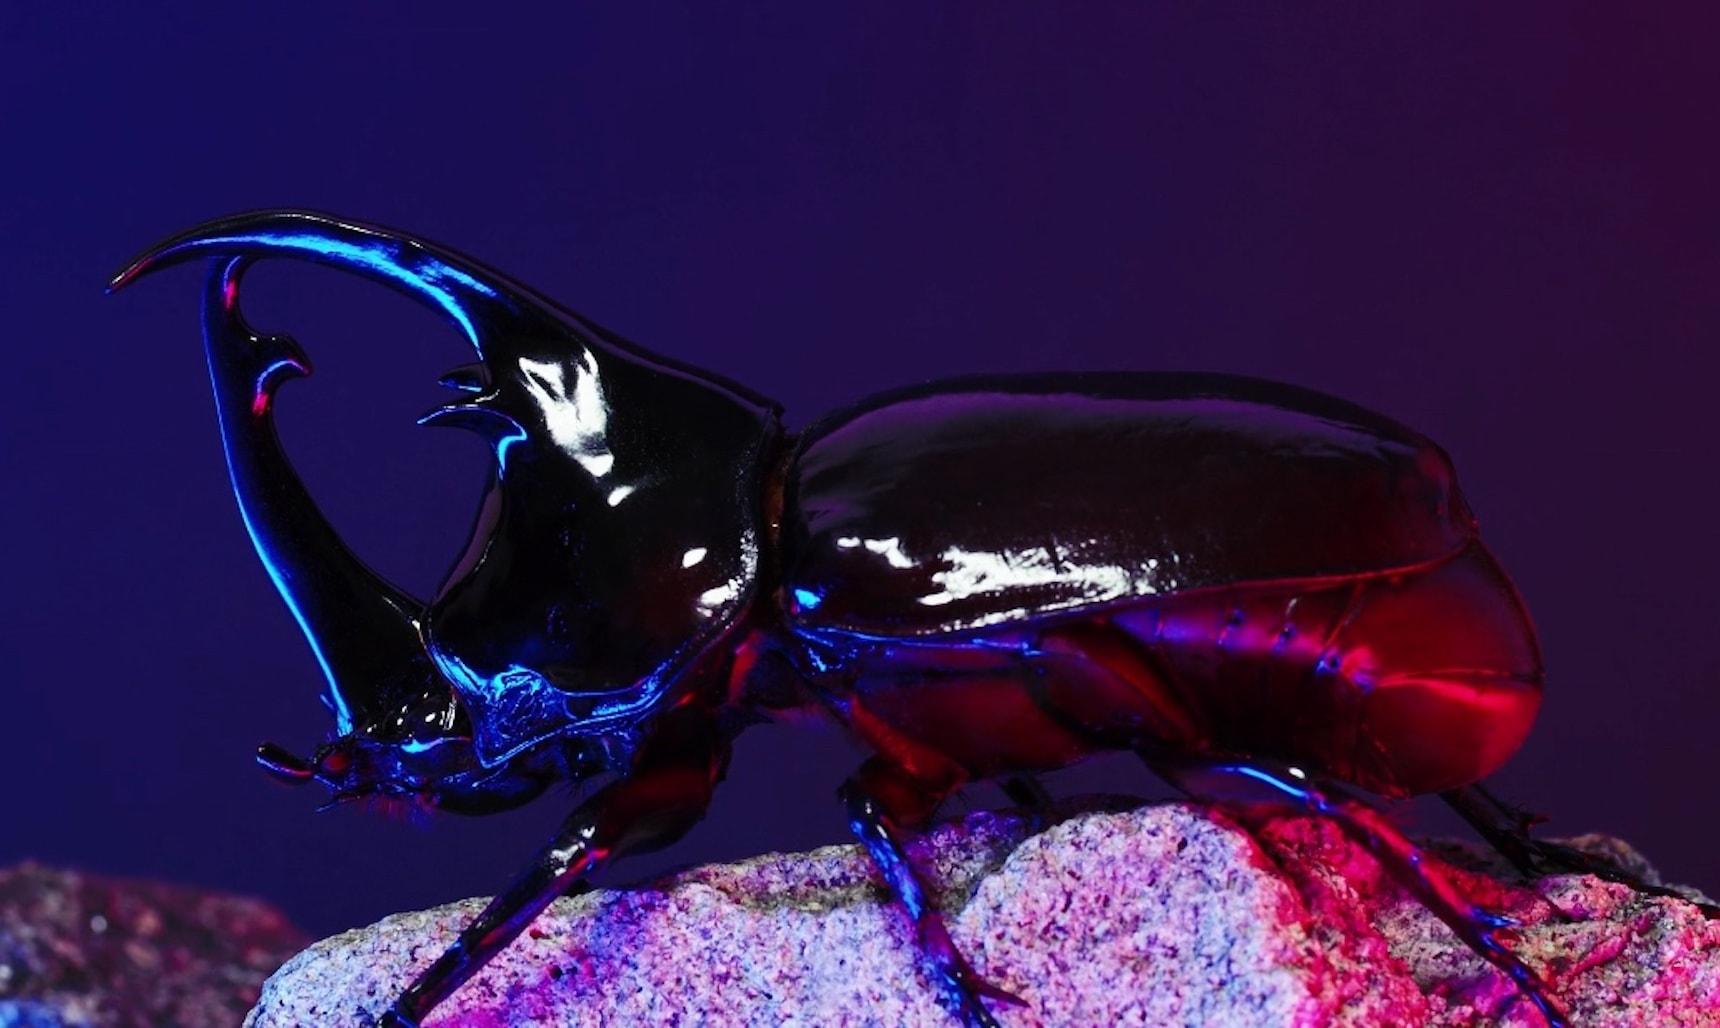 Stag-beetle in front of dark violet background